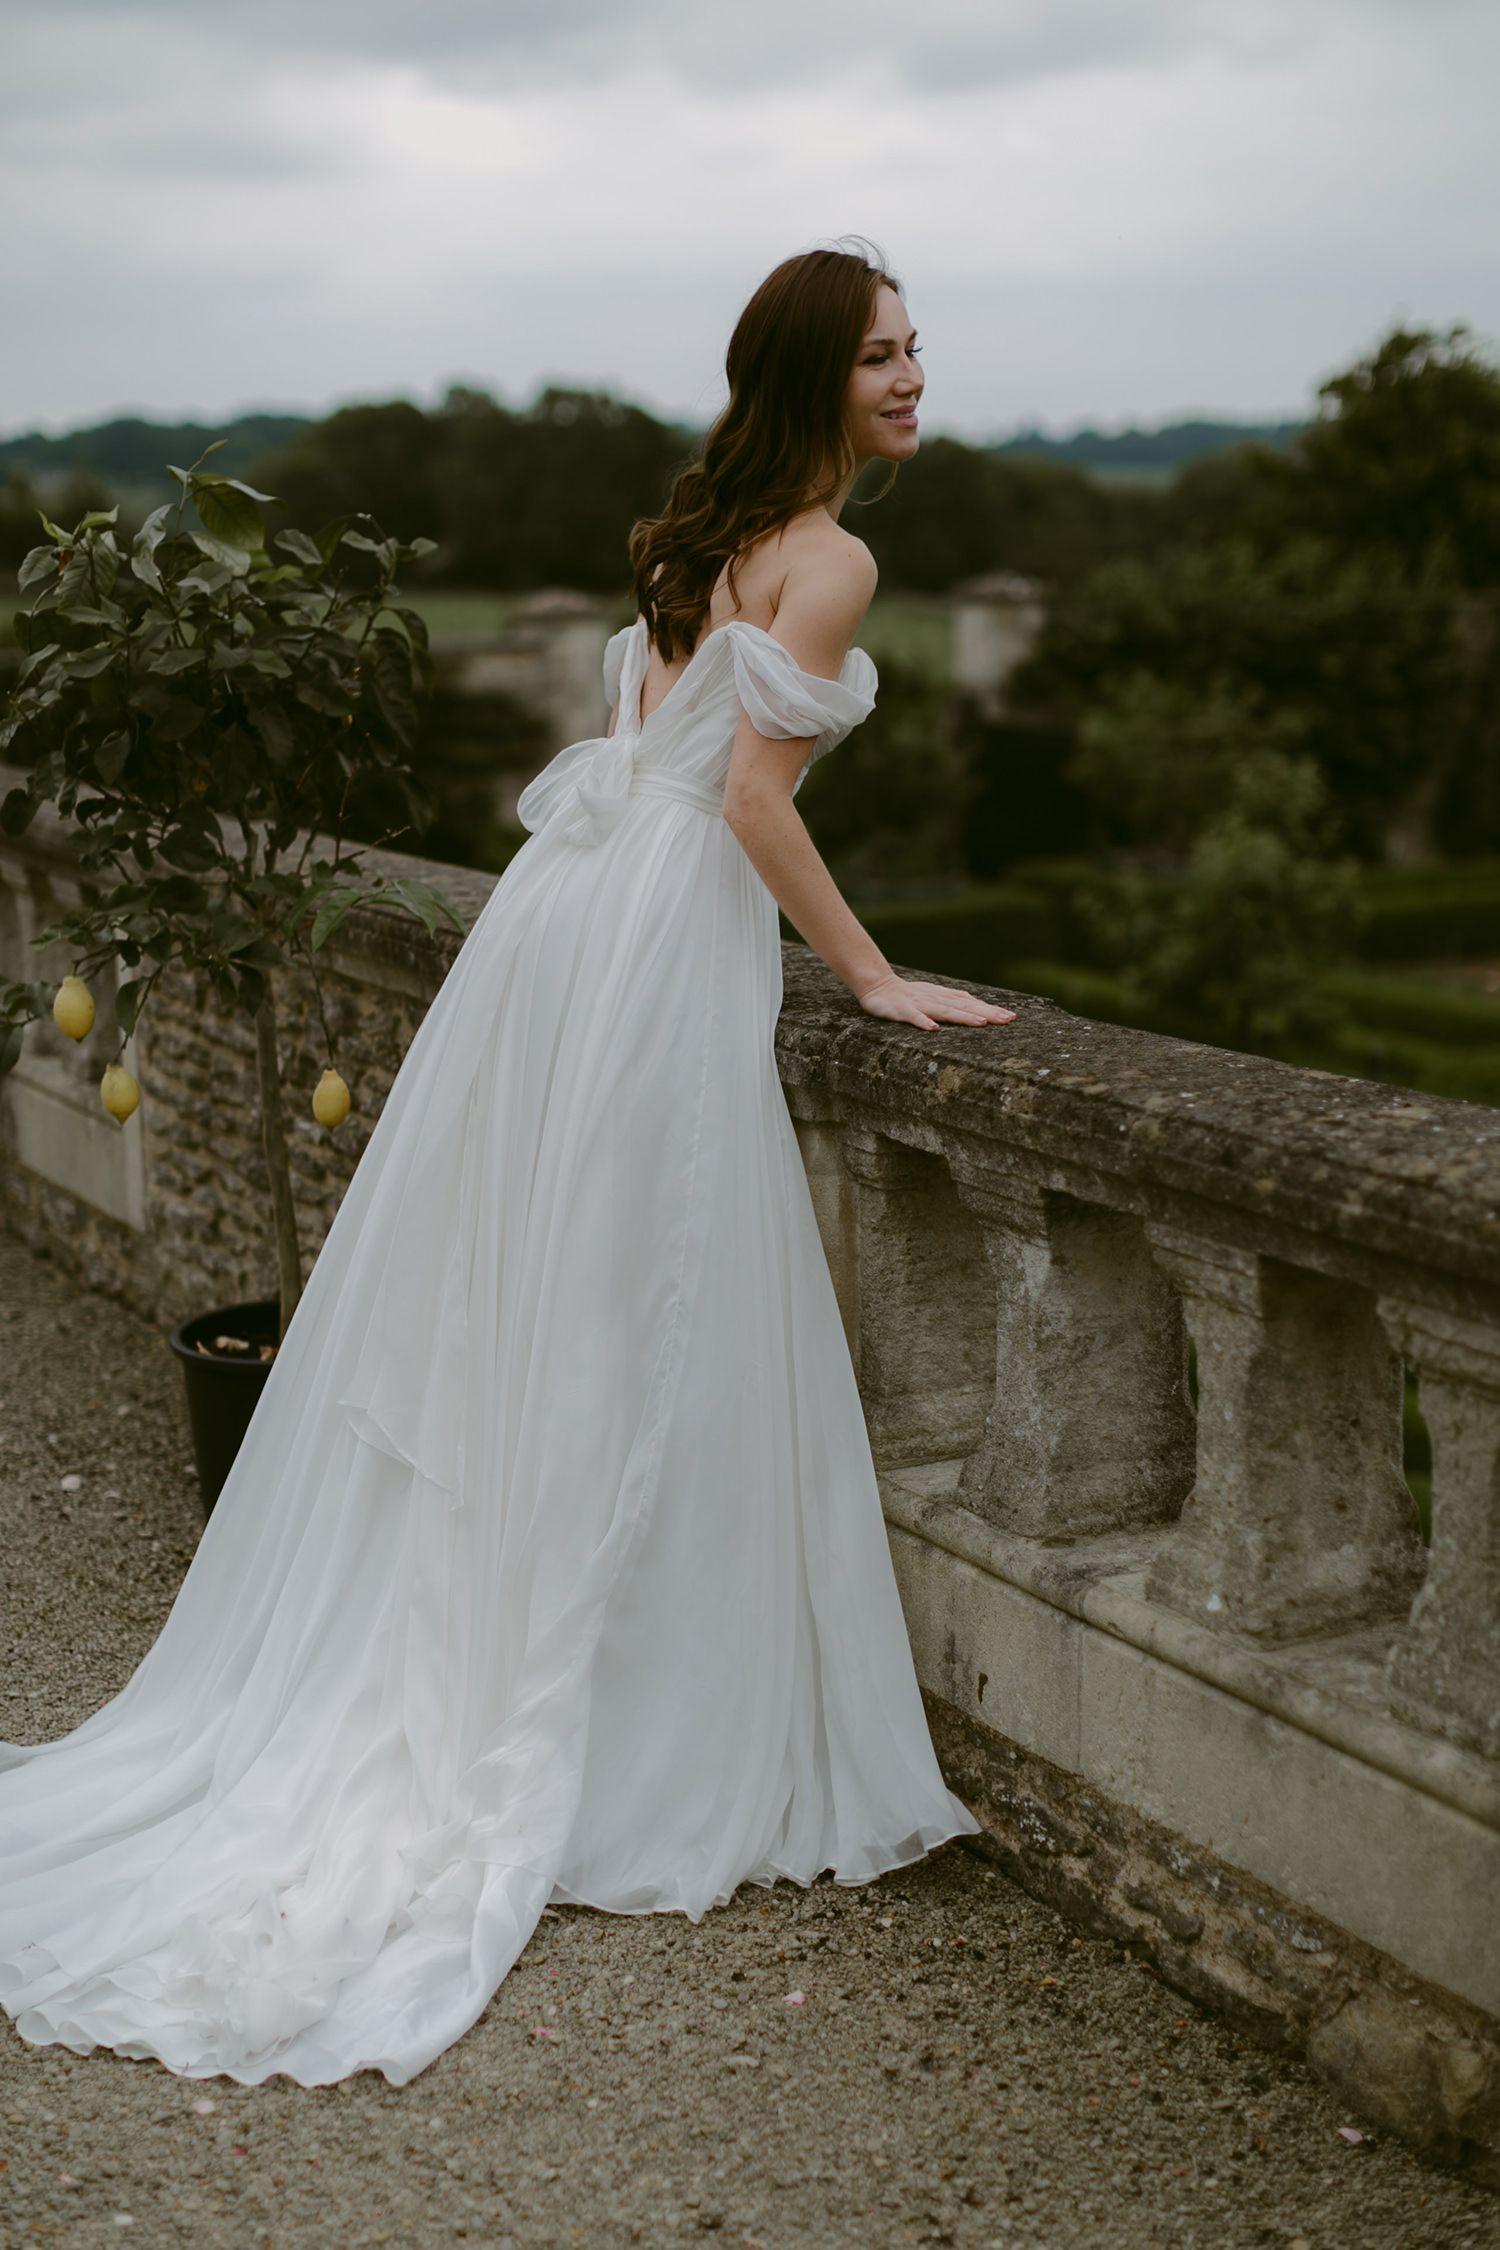 Wedding Dress Designer Naomi Neoh London Adam Grace Wedding Photographers Northern Ireland Du Ireland Wedding Dress 12 Wedding Dress Top Wedding Dresses